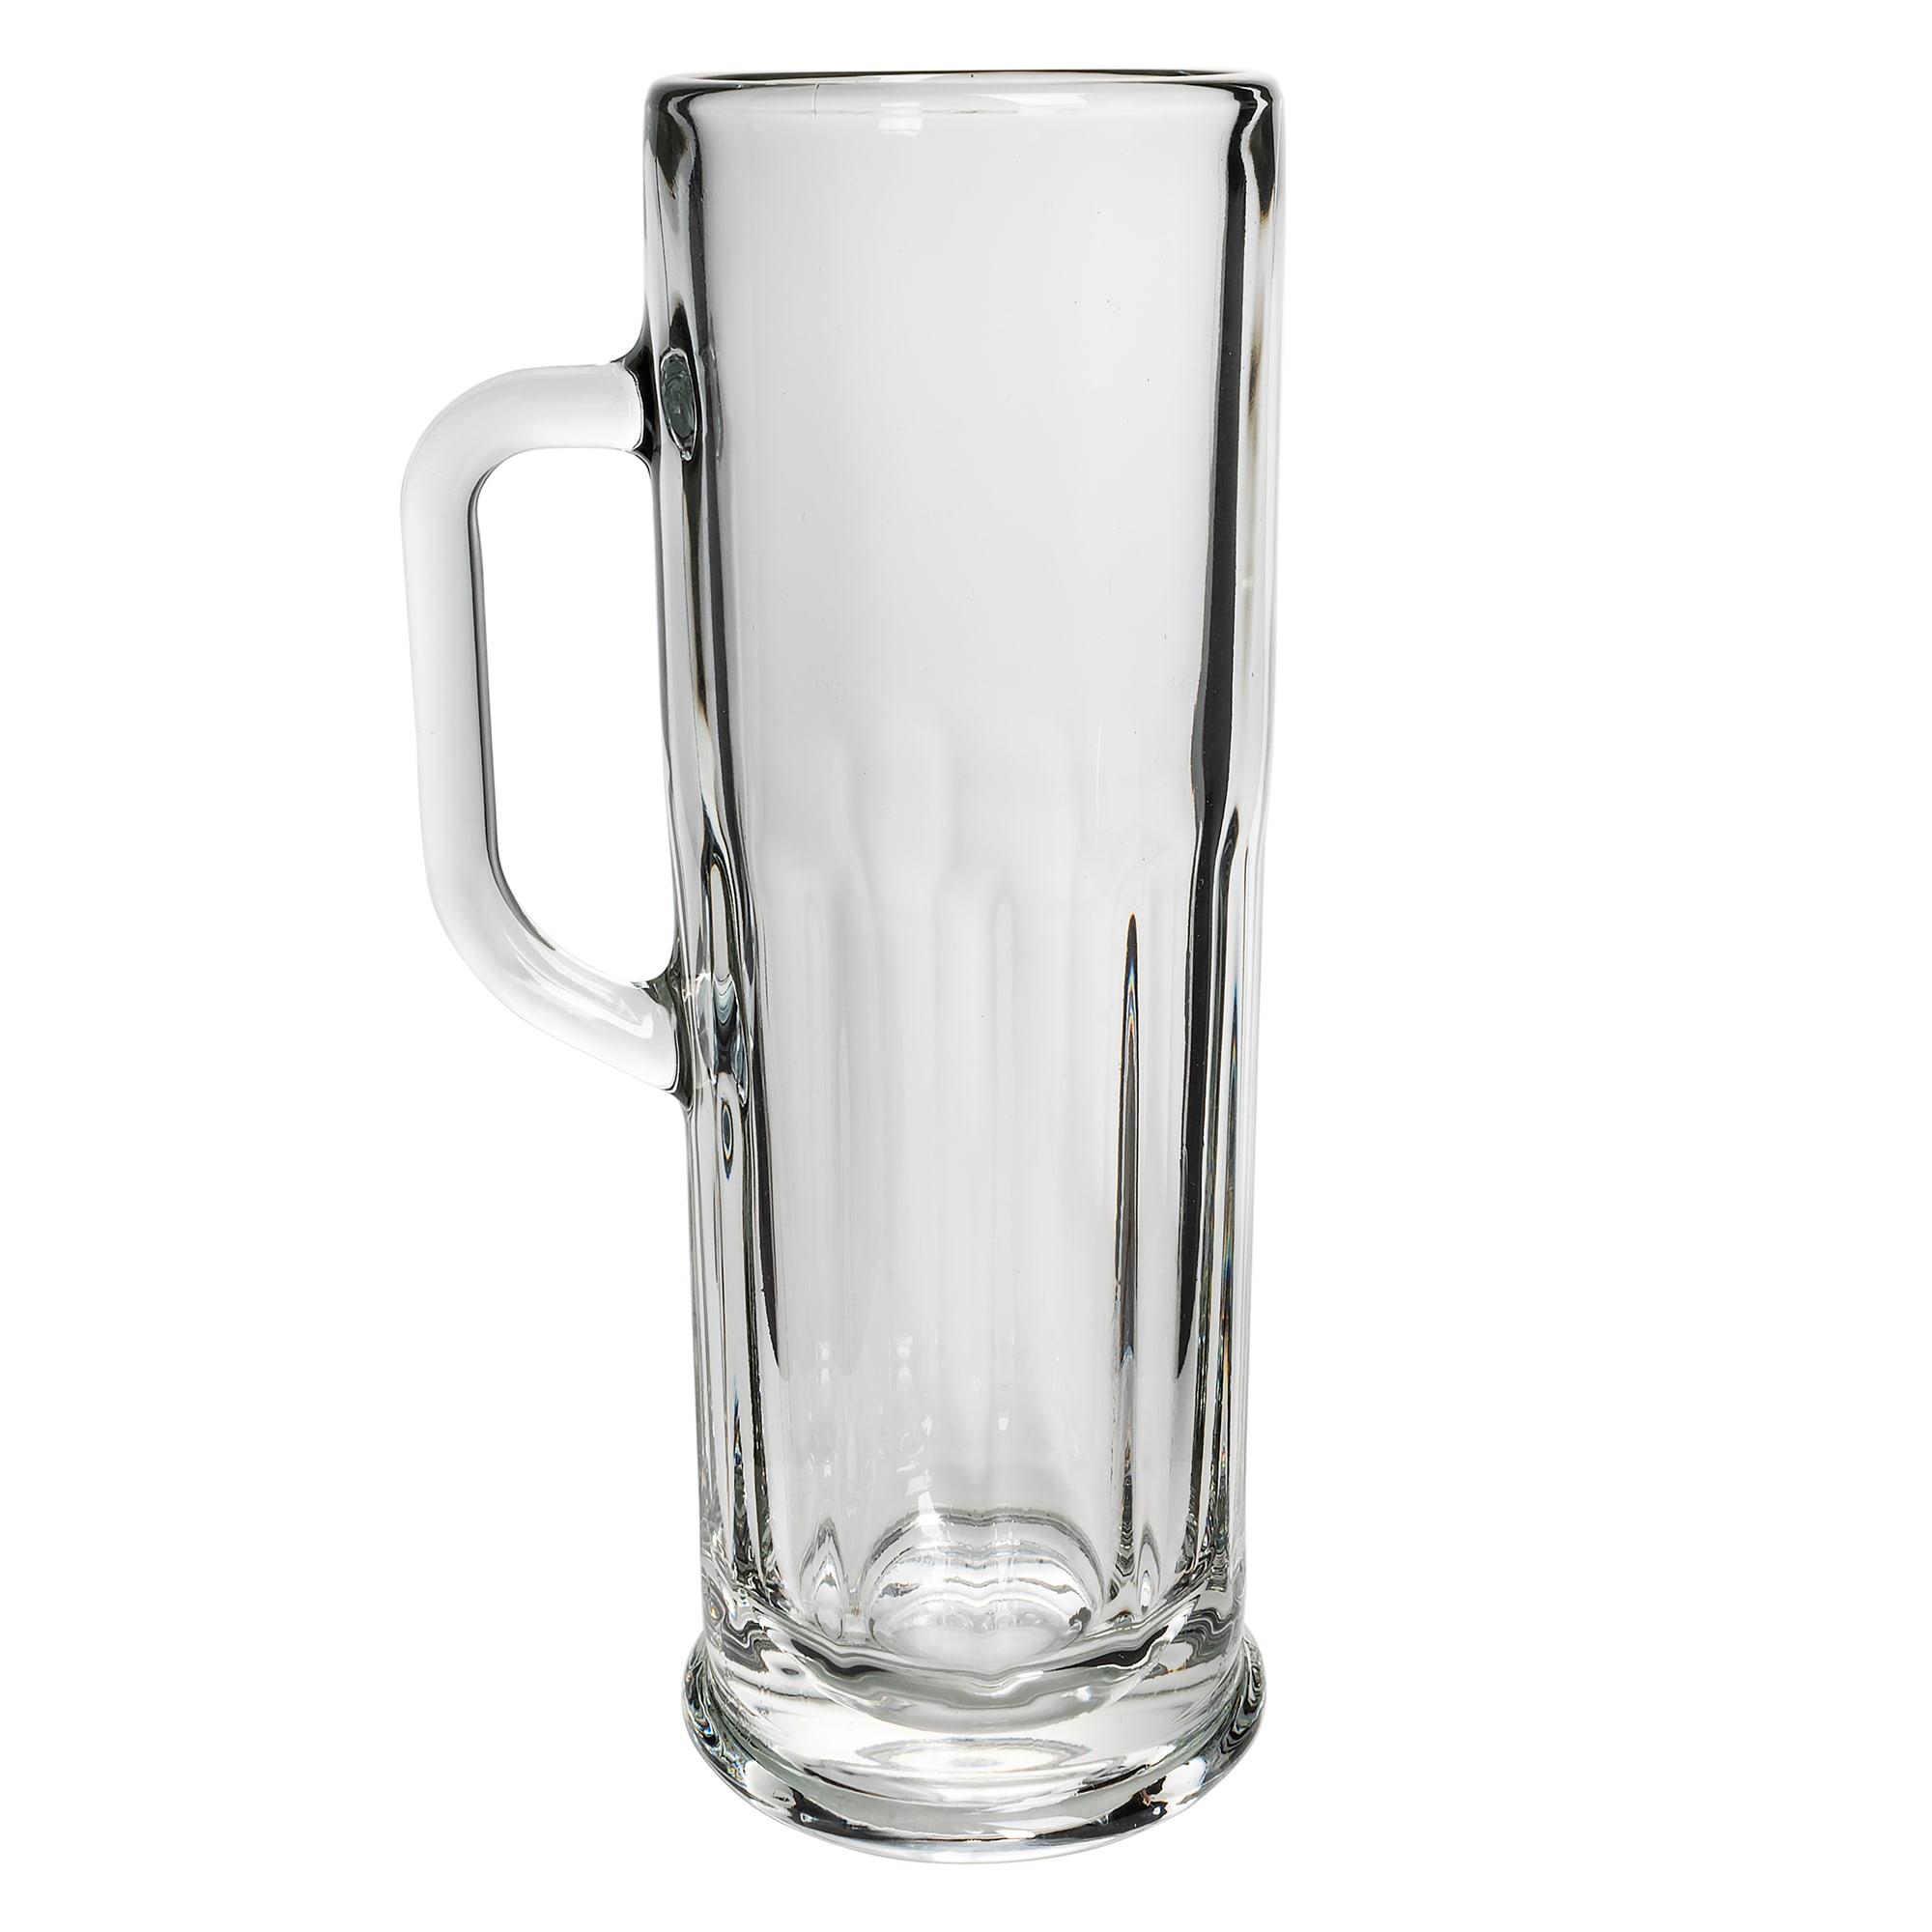 Libbey 5001 21-oz Mug Glass